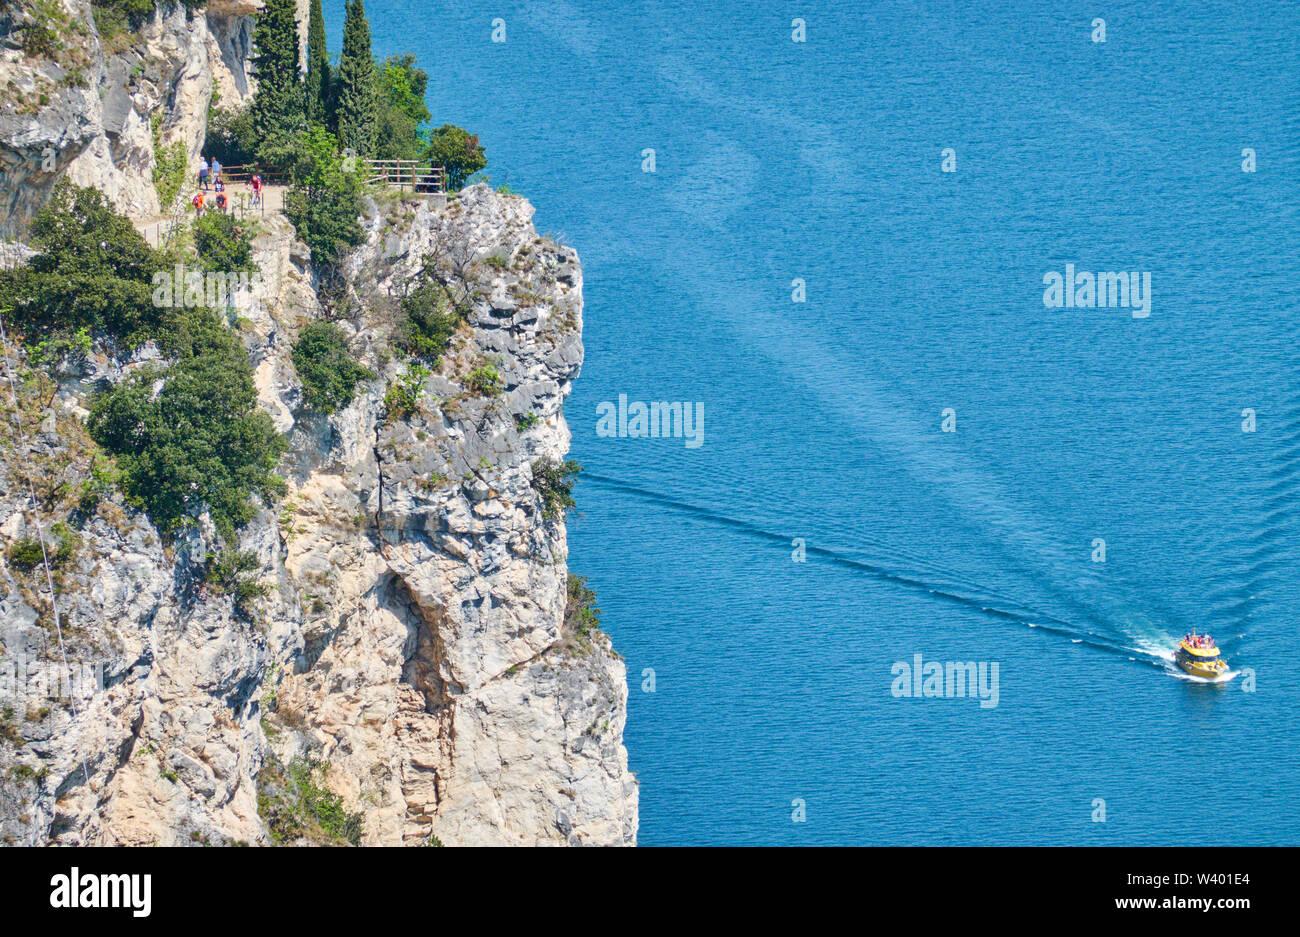 Bike road up to Pregasina  and a tourist cruising motorboat at Lago di Garda, Lake Garda in Torbole - Nago, Riva, Trentino , Italy at April 17, 2019. - Stock Image